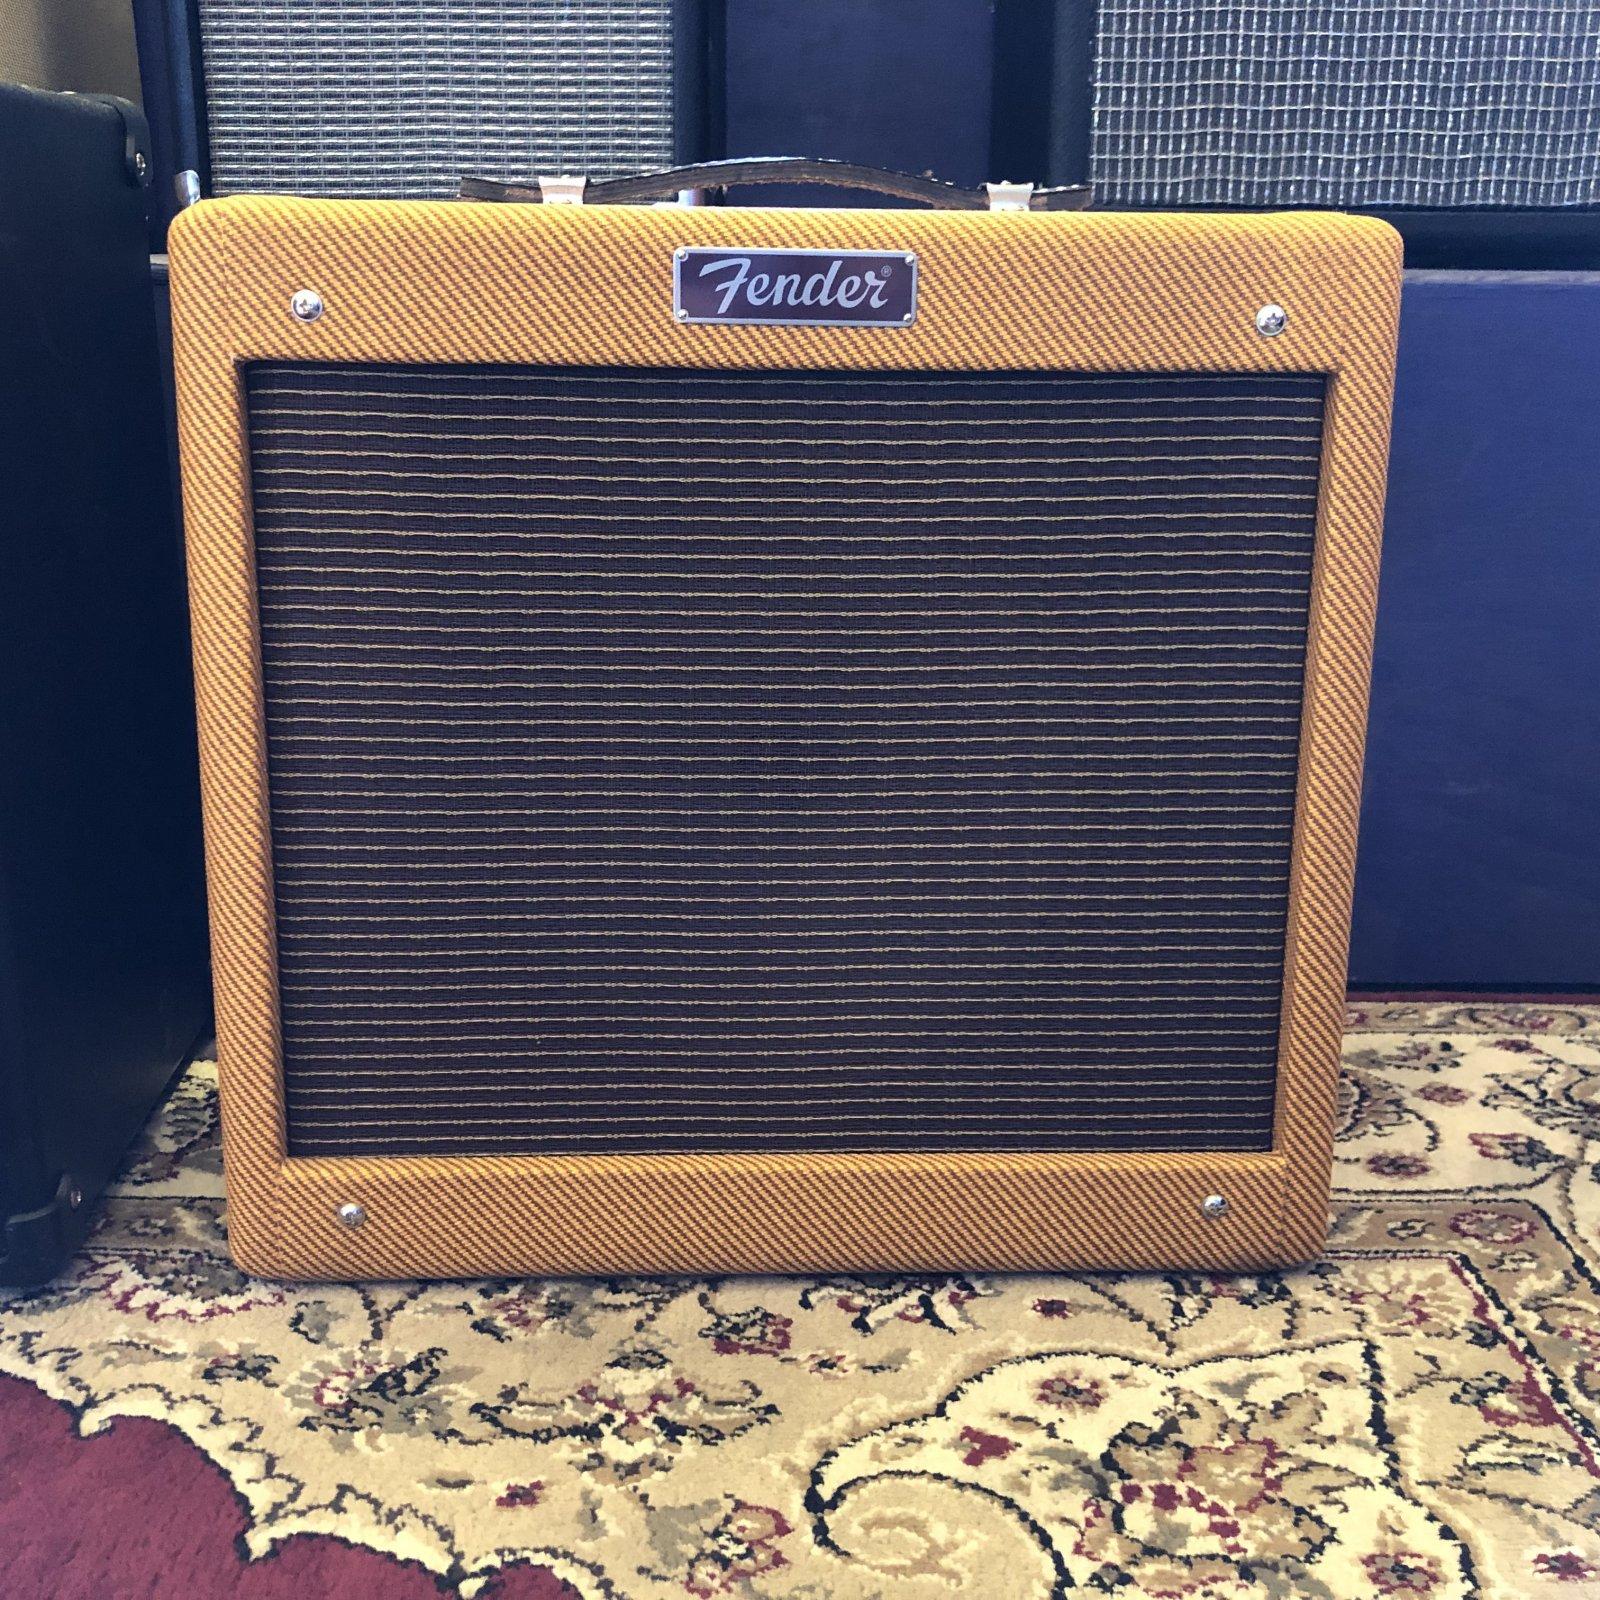 Used Fender Tweed Pro Jr.